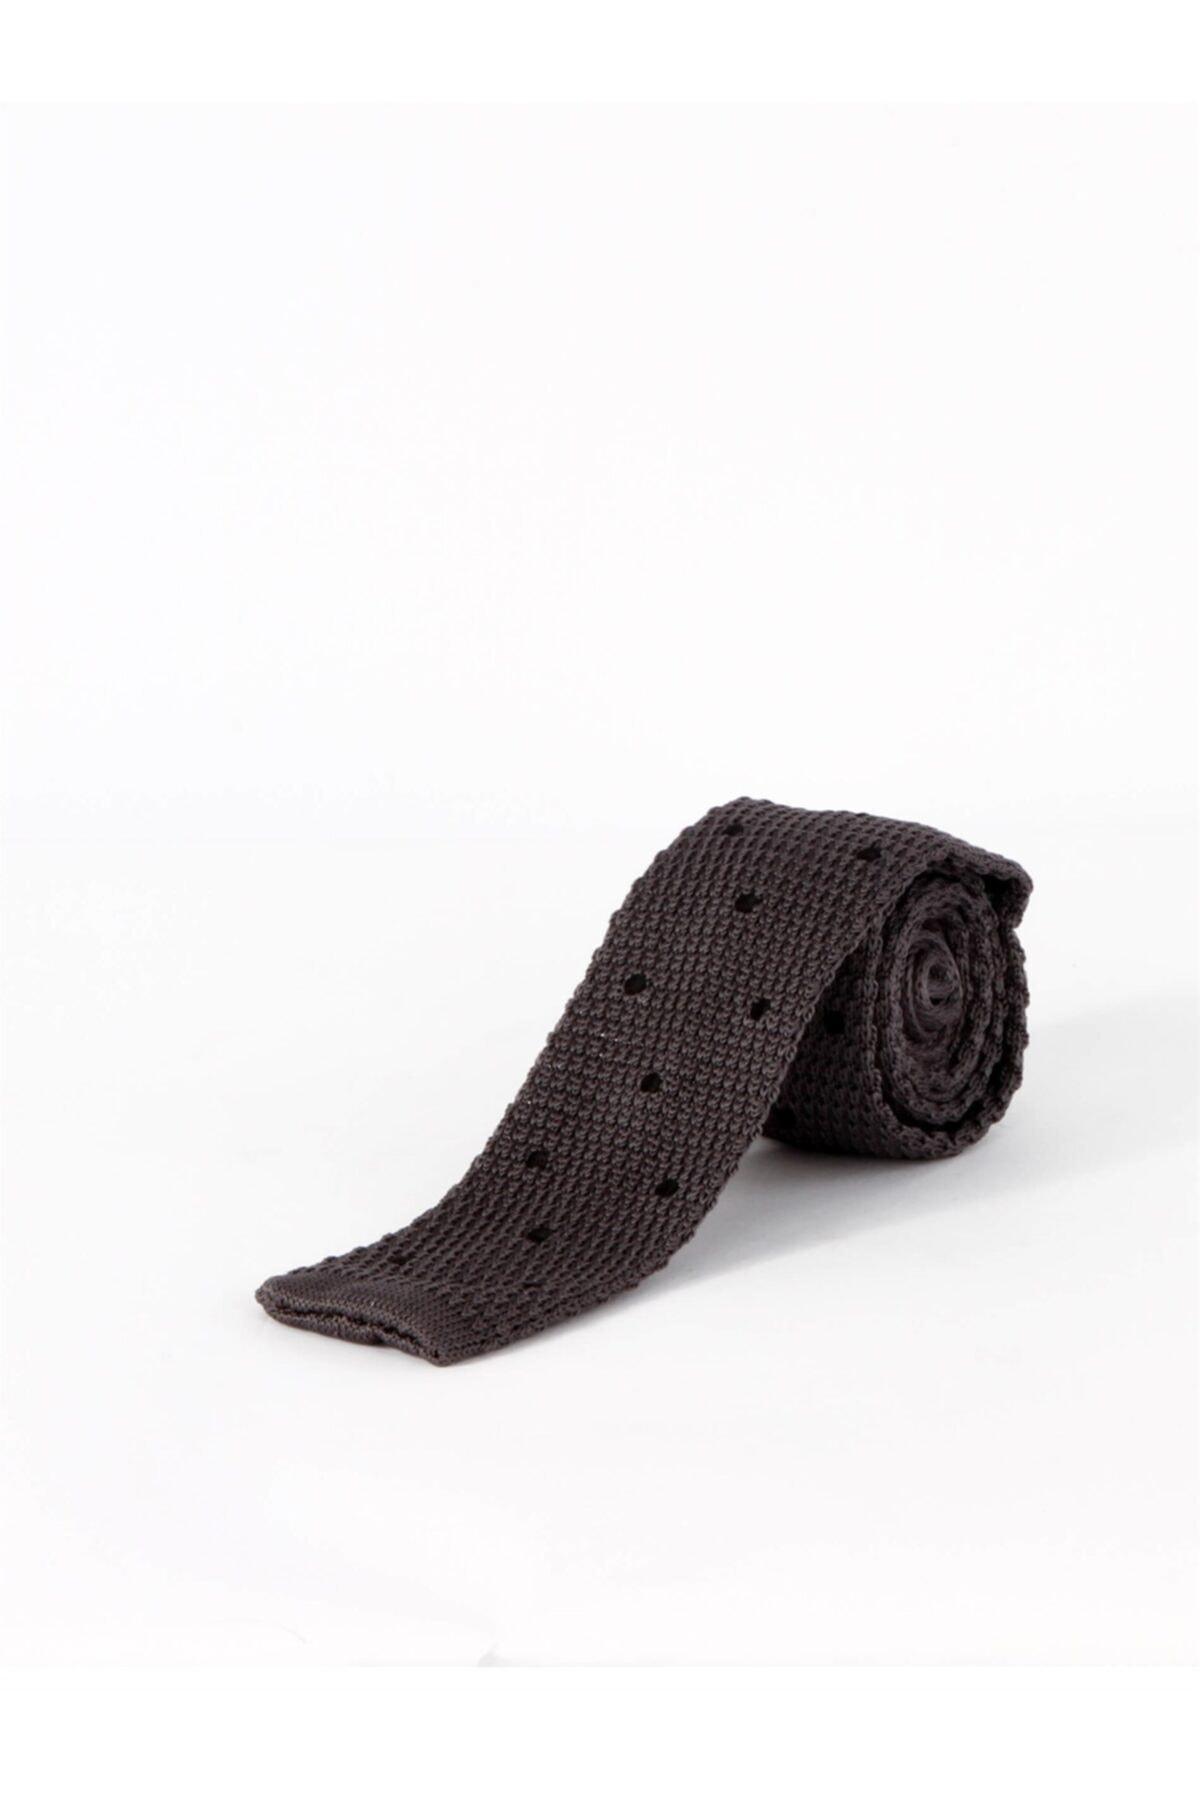 خرید نقدی کراوات ترک برند Dufy رنگ مشکی کد ty93977213